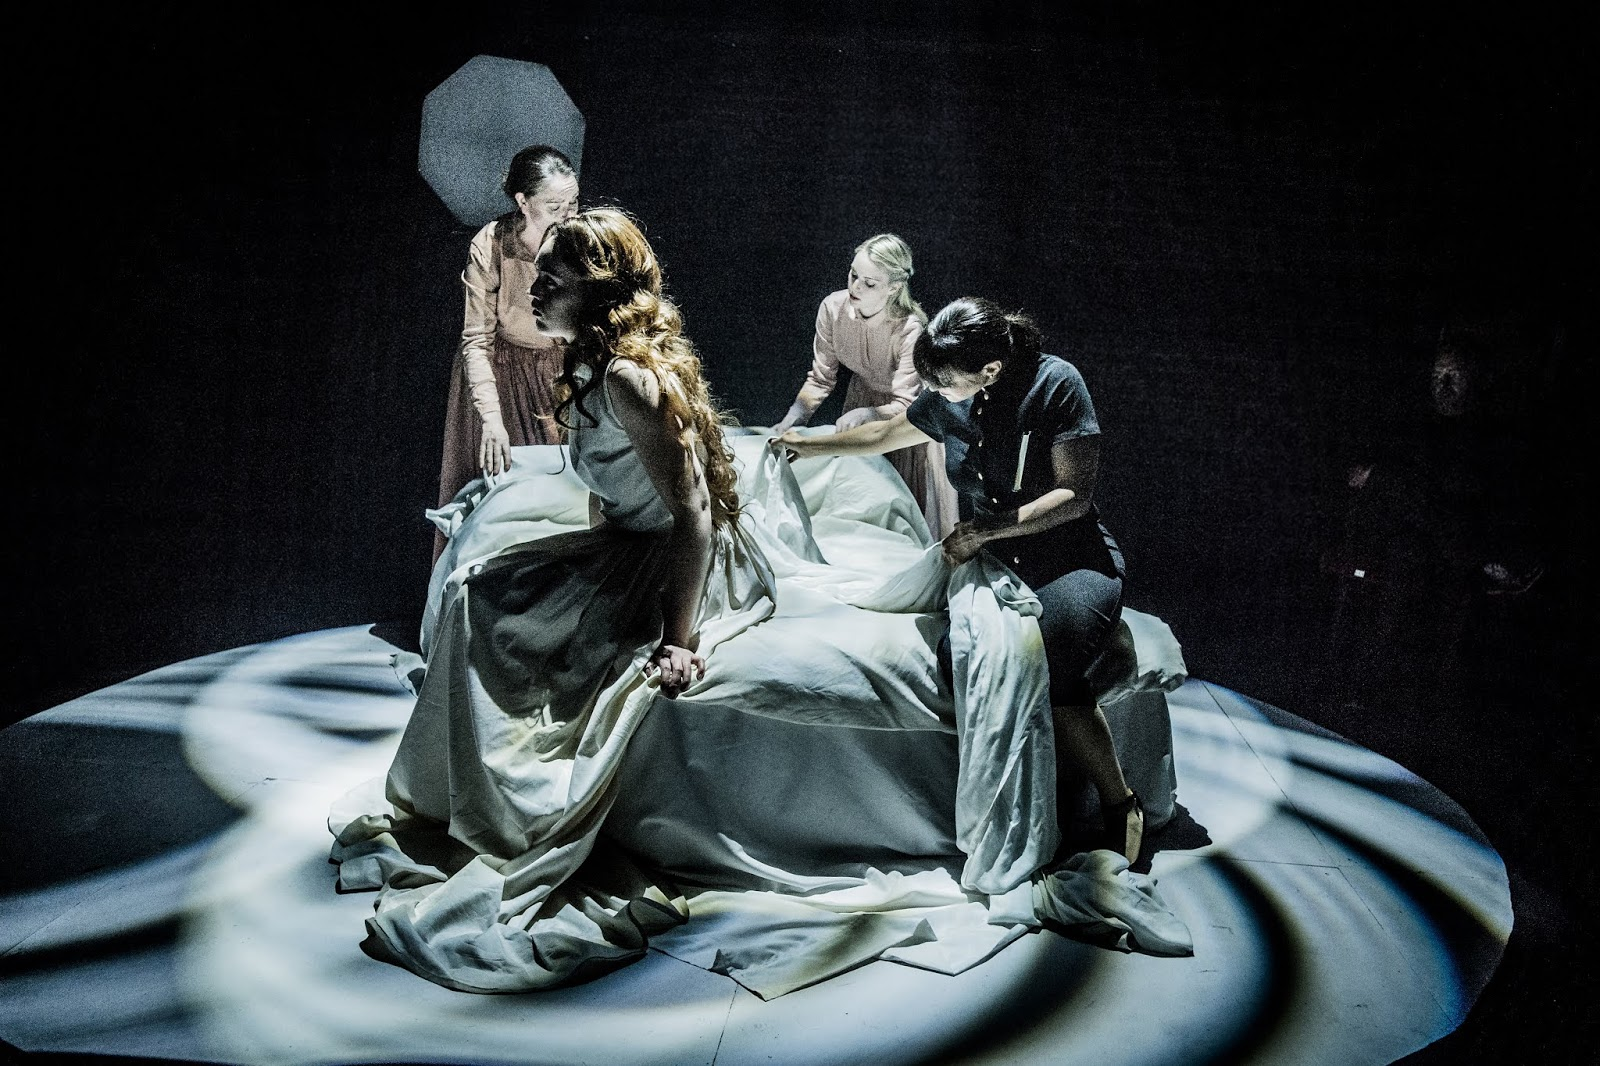 Lucretia through a newcomer's eyes and ears